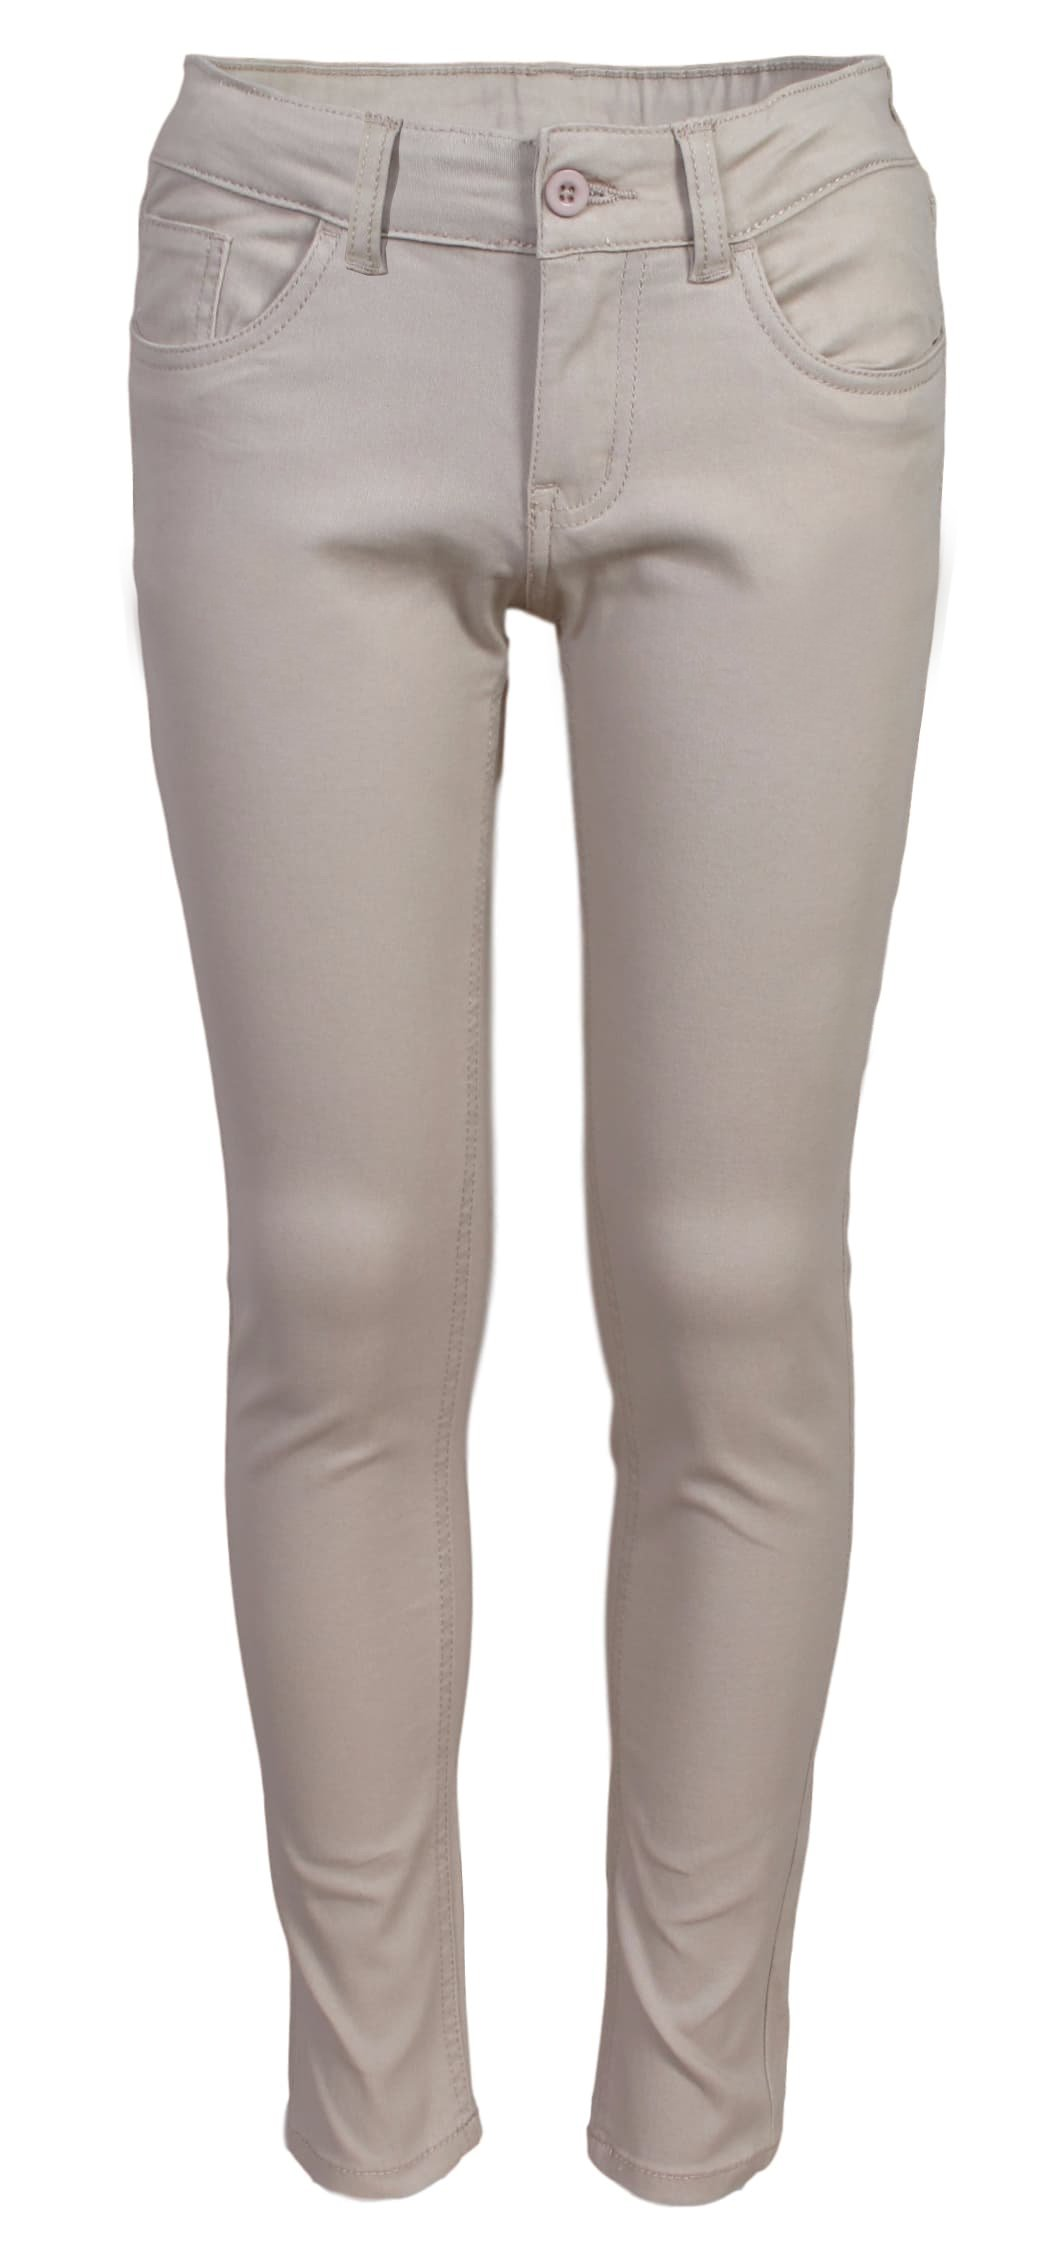 'Beverly Hills Polo Club Girls School Uniform Skinny Stretch 5 Pocket Twill Pants with Belt, Khaki, Size 12'